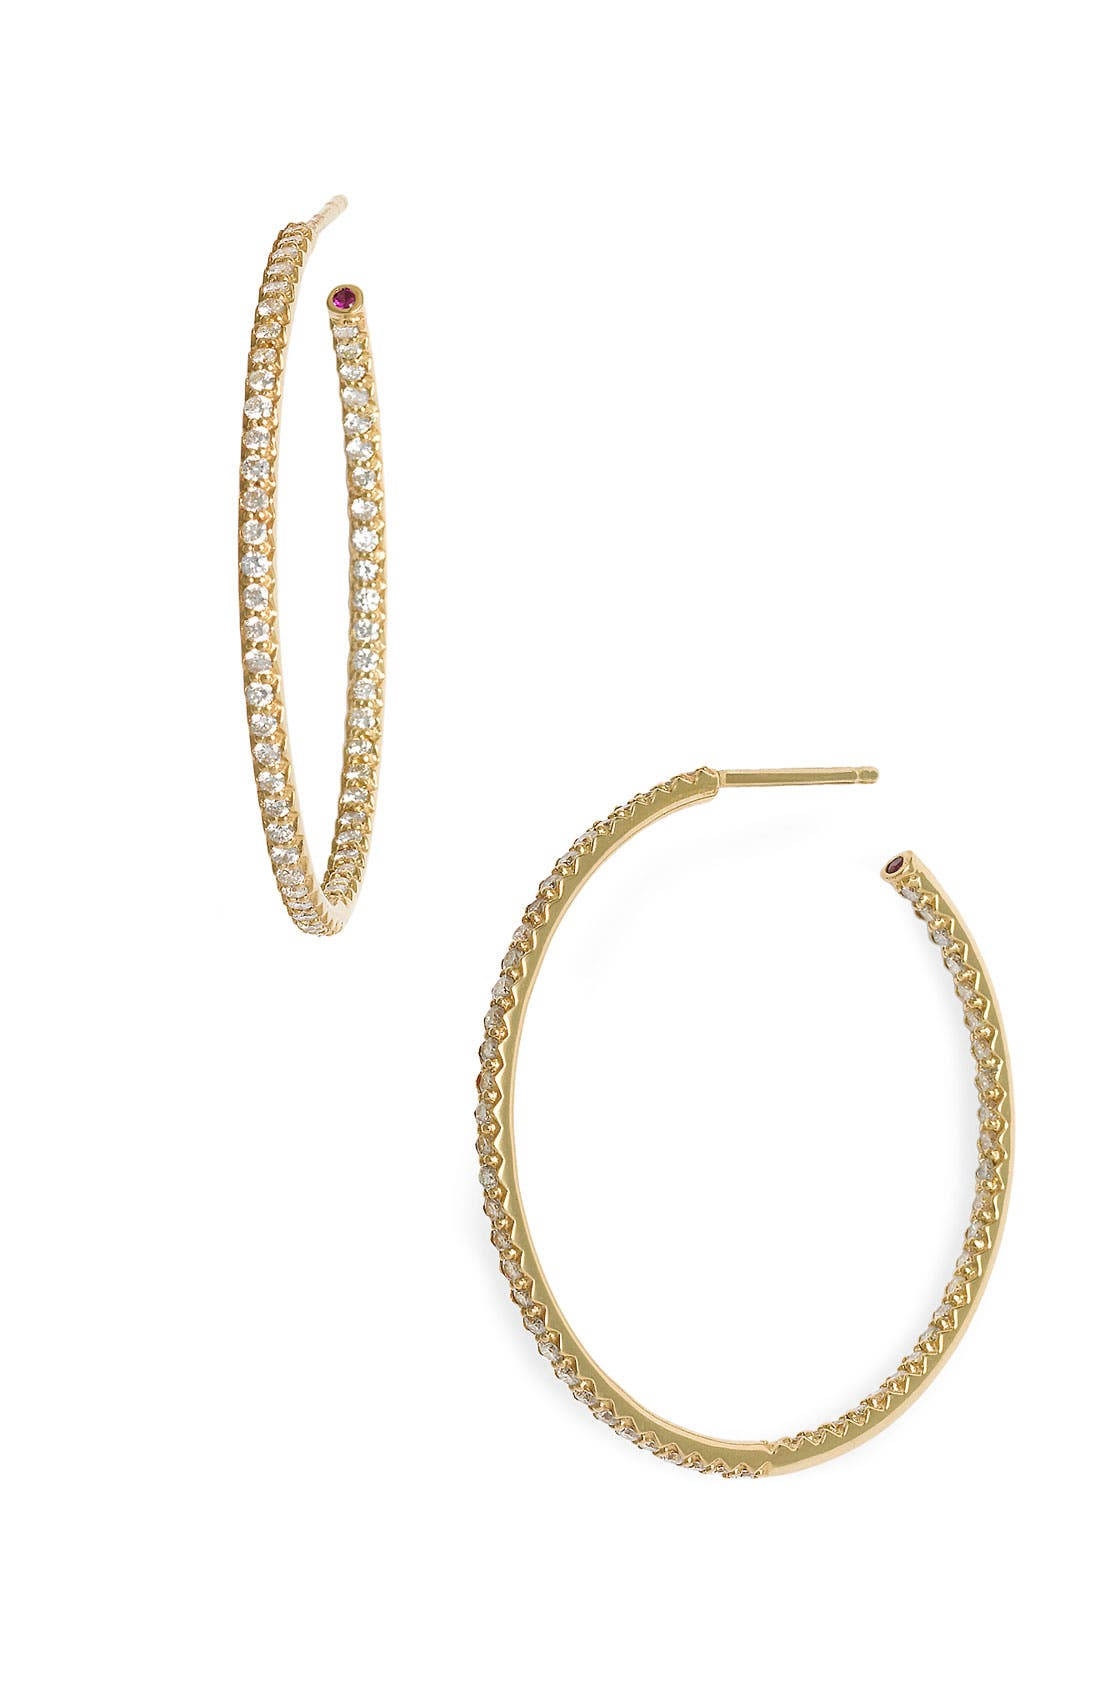 Alternate Image 1 Selected - Roberto Coin Inside Out Diamond Hoop Earrings